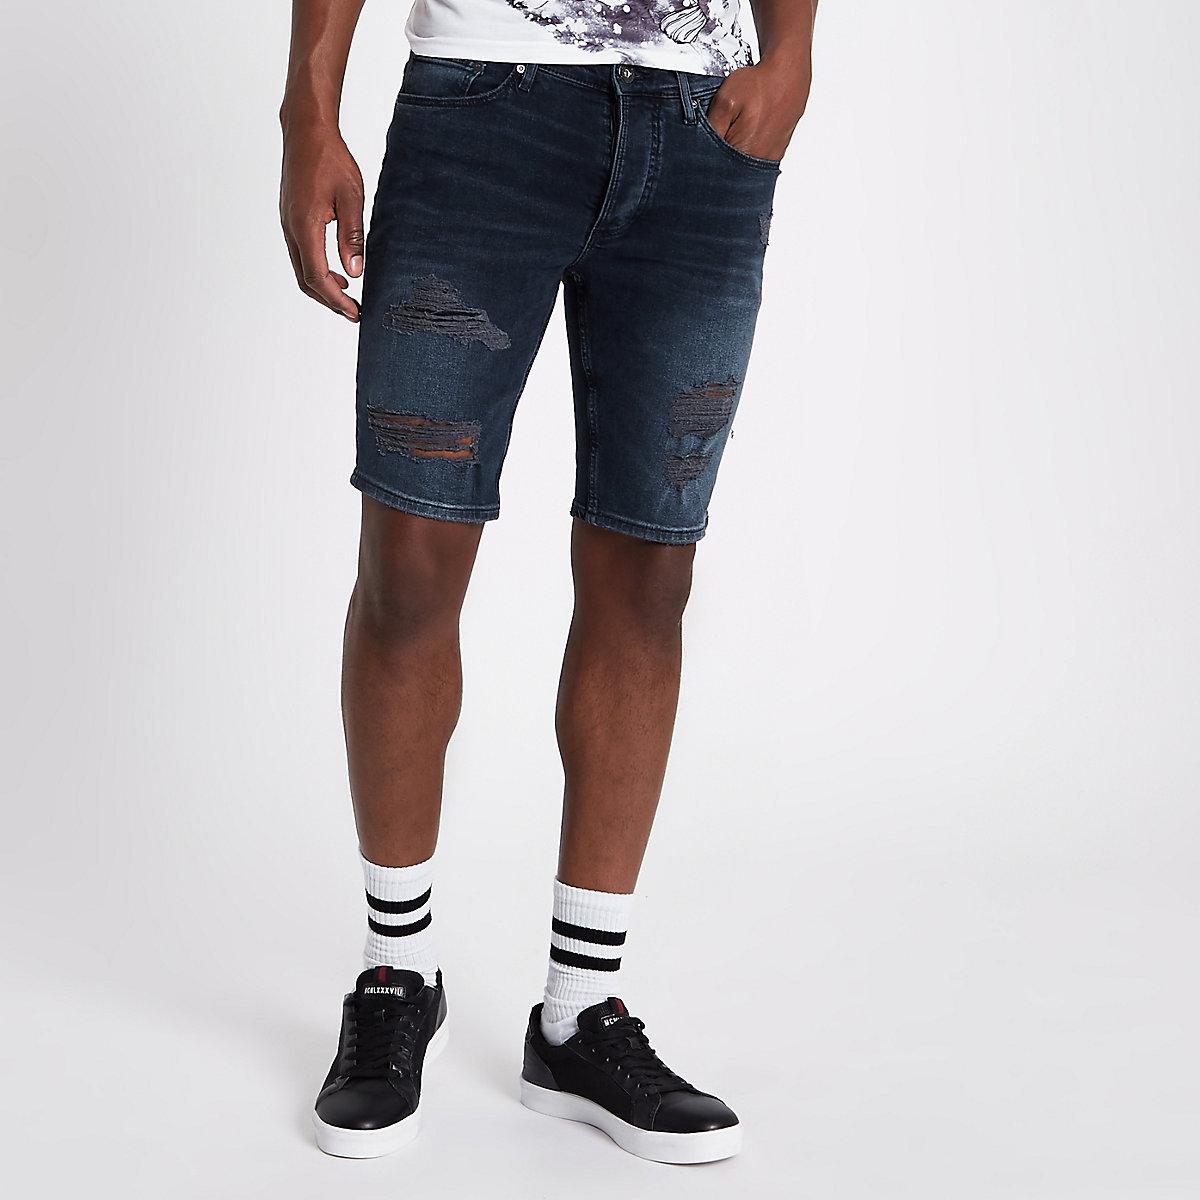 Dark blue ripped skinny fit denim shorts